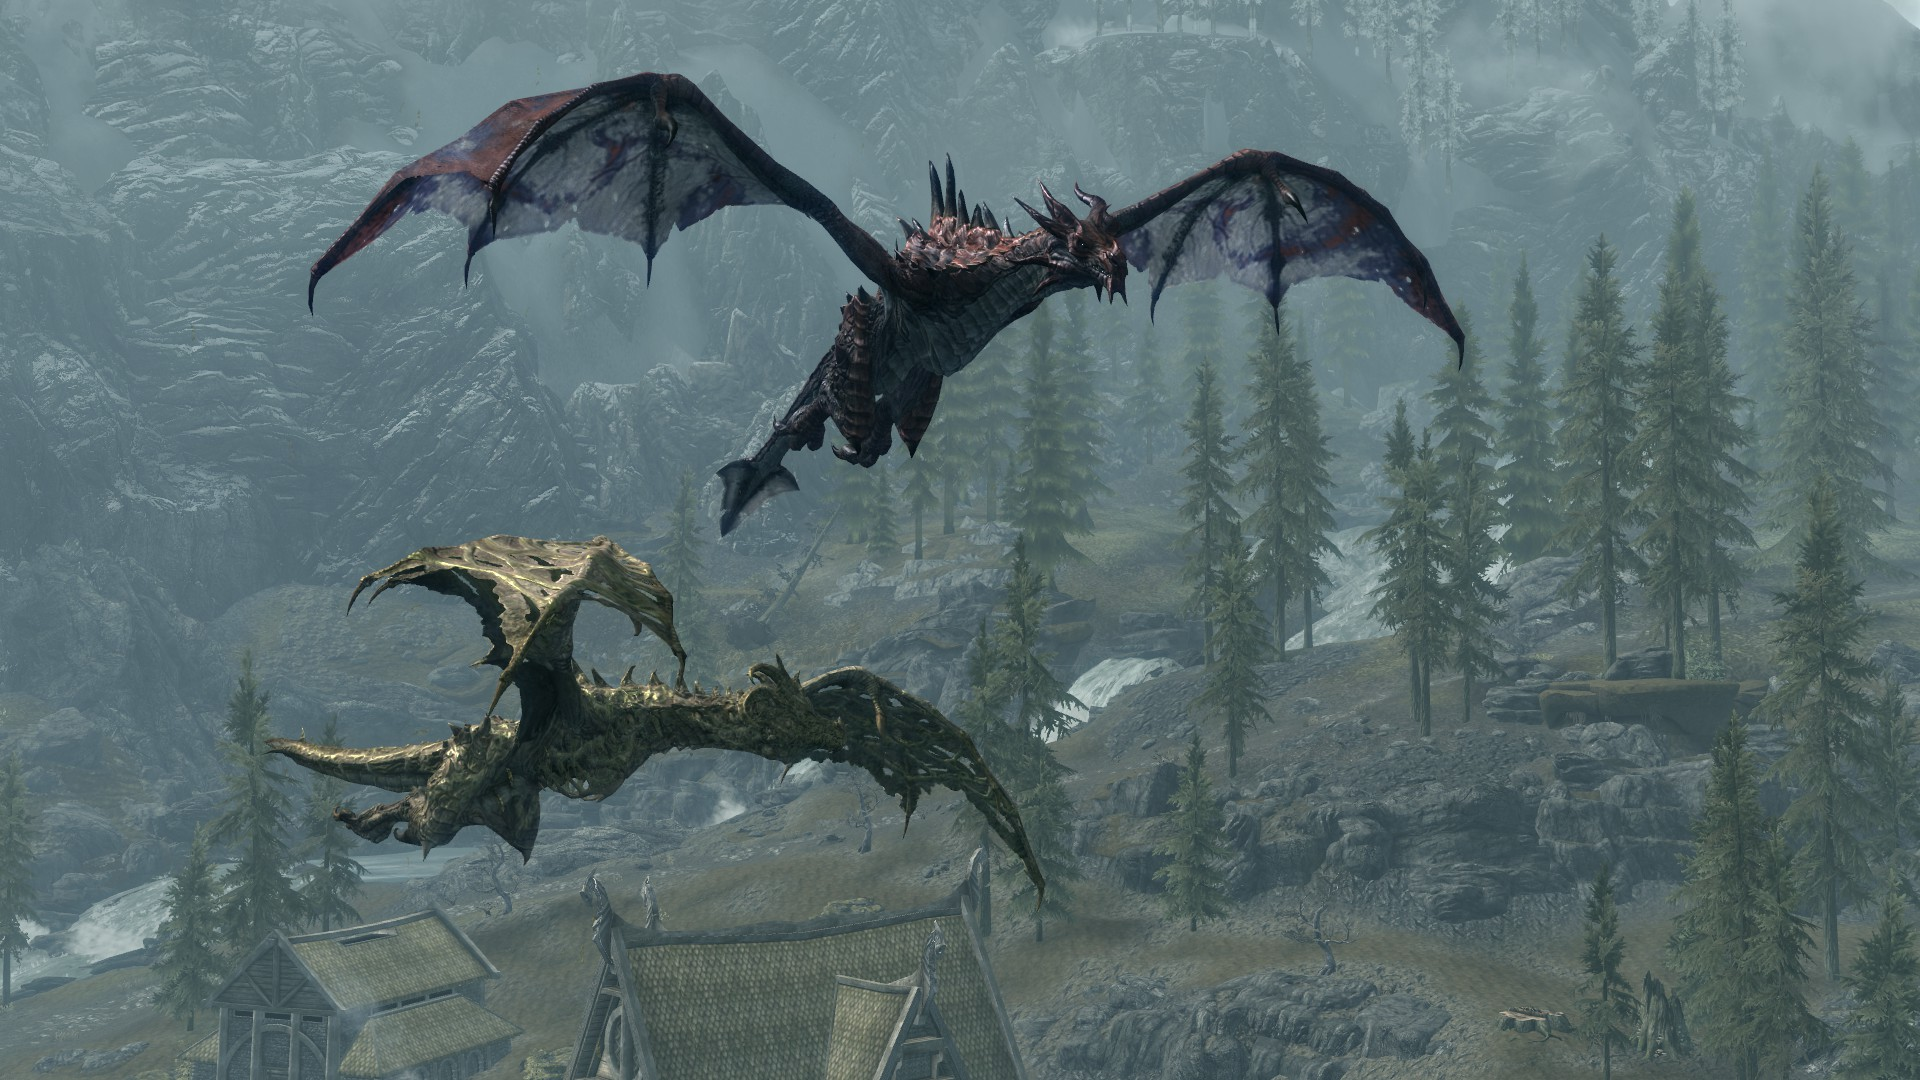 дракон скайрима картинки взаимодействия